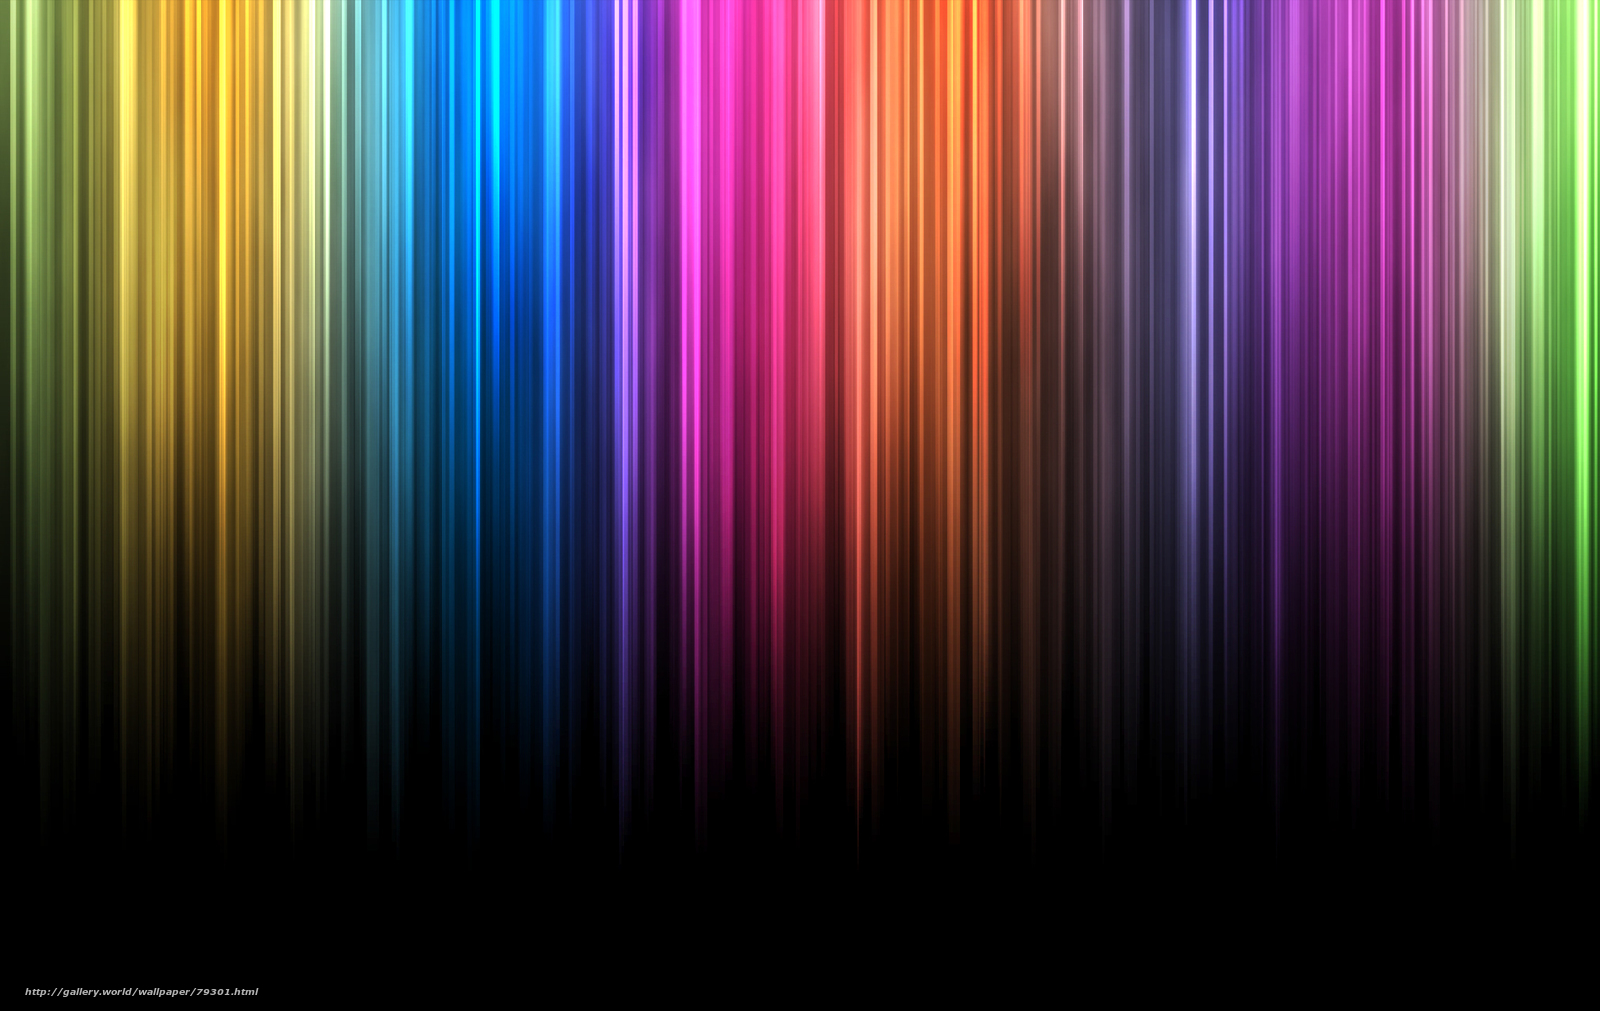 Tlcharger fond d 39 ecran sombre rayons couleur fonds d for Fond ecran sombre